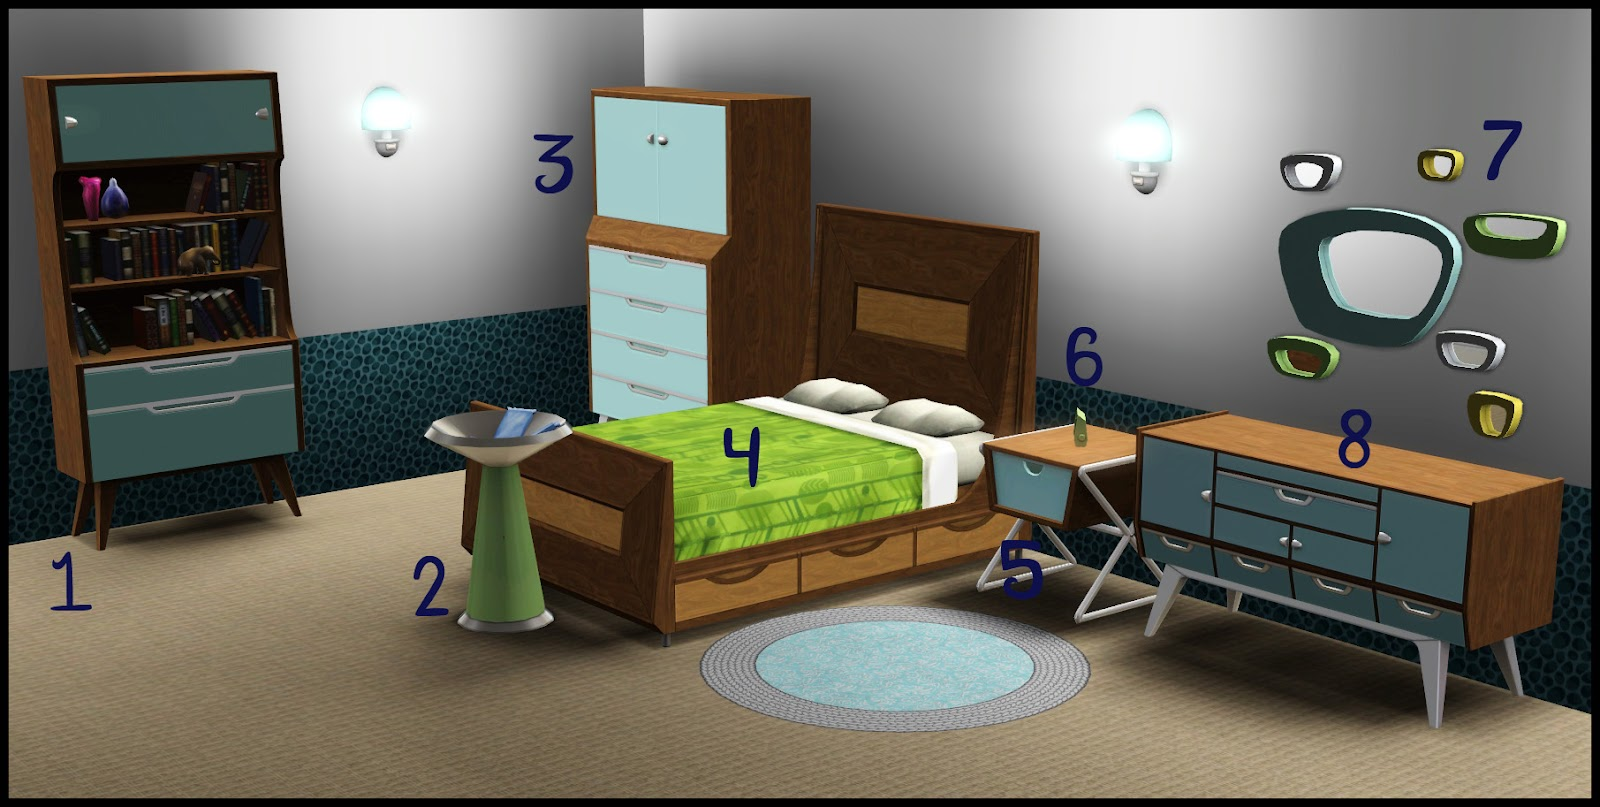 Nightdove sims store a mid century modern trailblazer set Mid century modern bedroom set